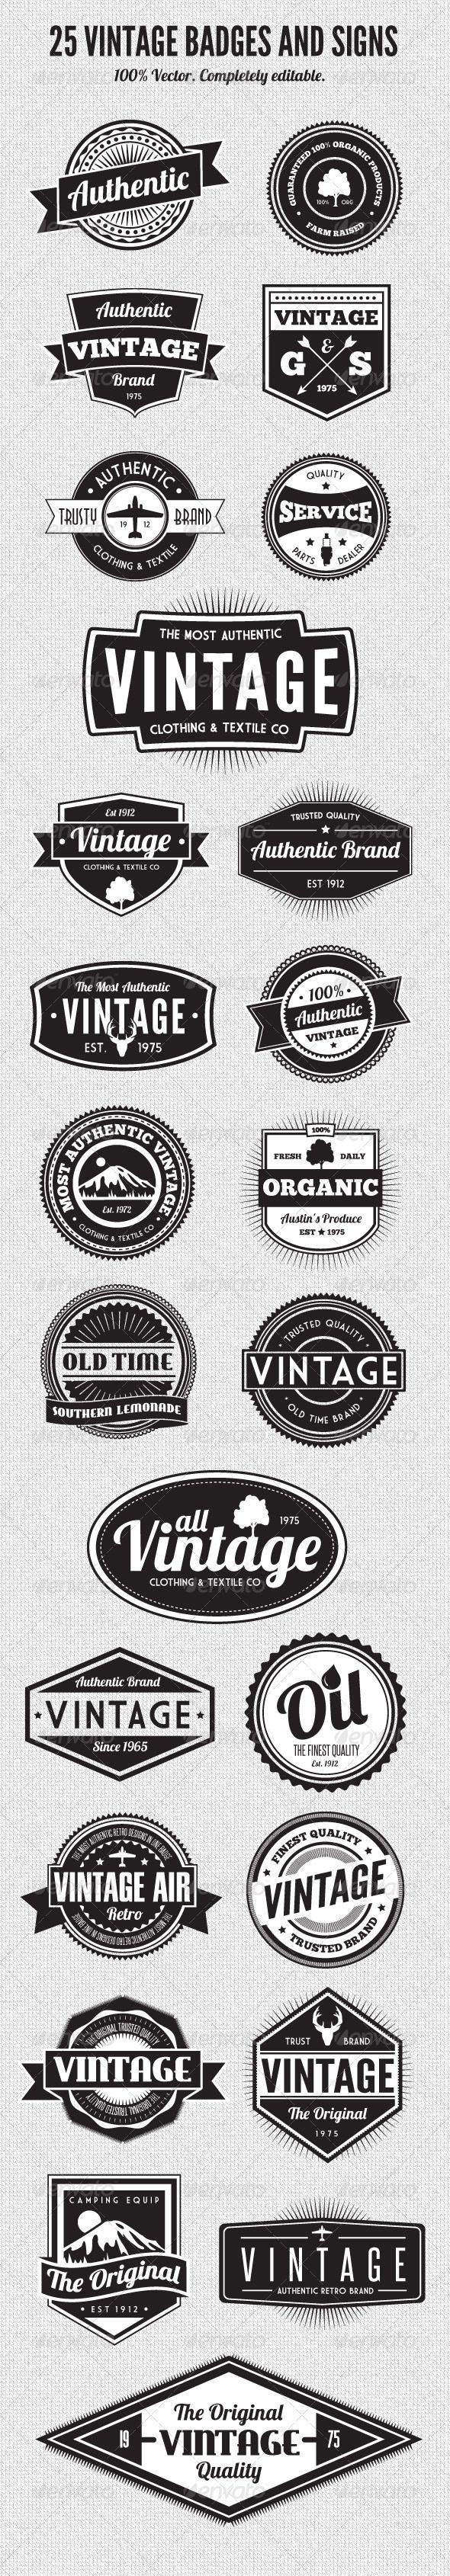 Camp T-shirt design inspiration 25 Premium Retro Style Vector Badges: